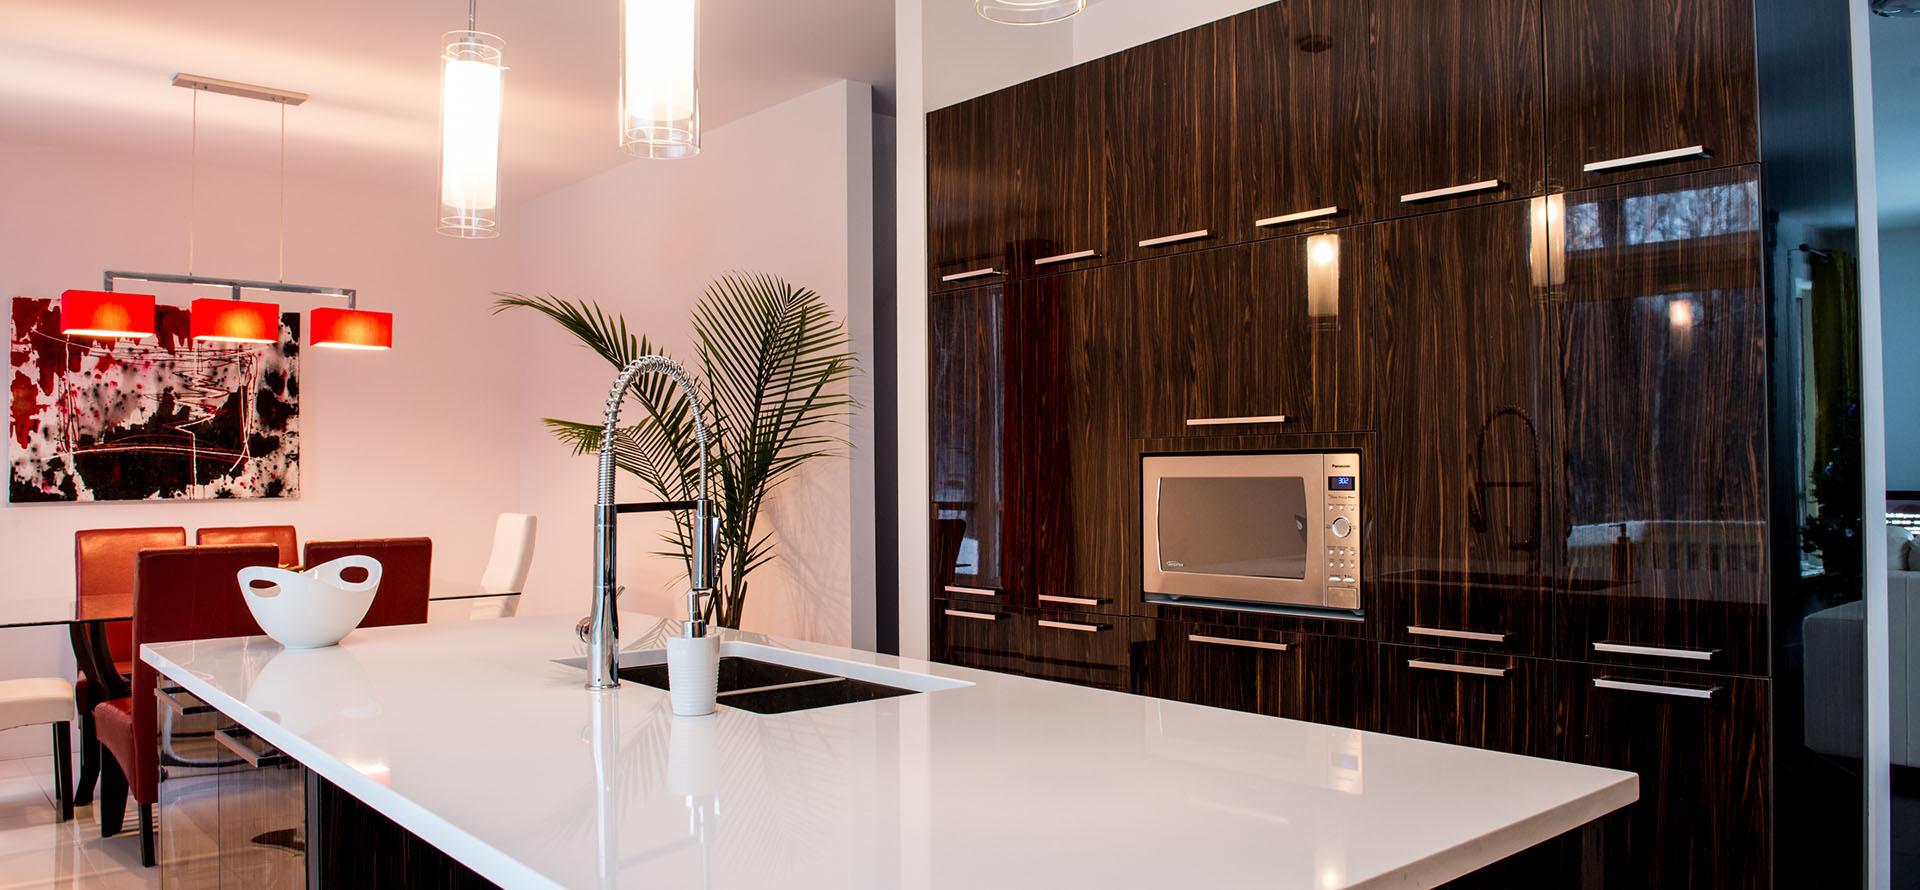 cuisine moderne coaticook avec des id es